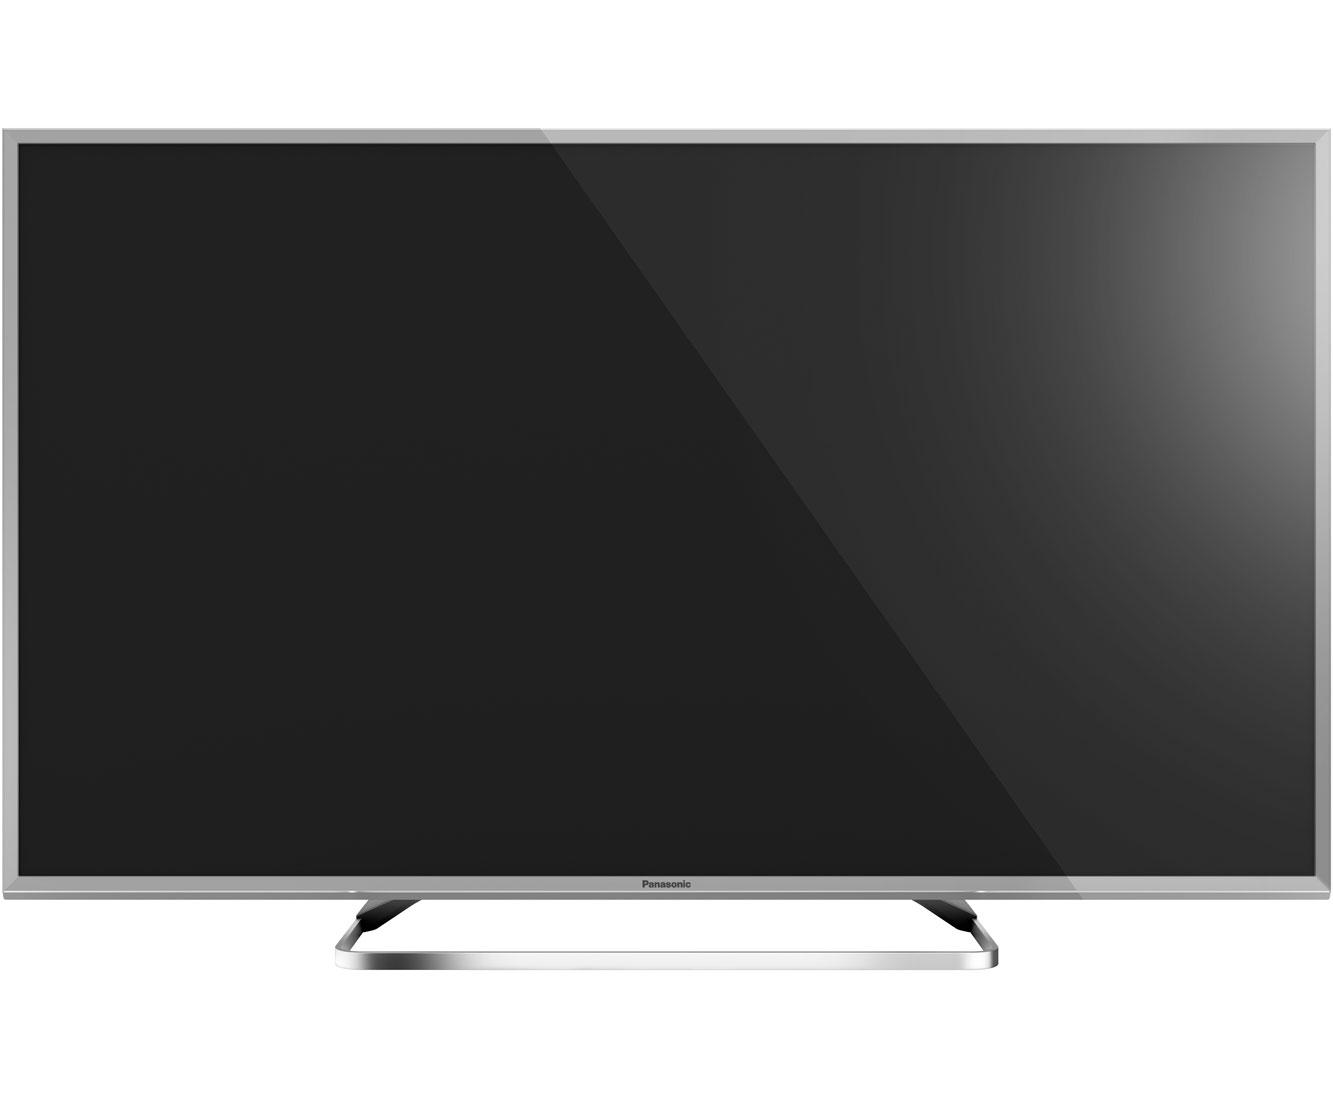 Panasonic TX-43FSW504S Fernseher - Silber